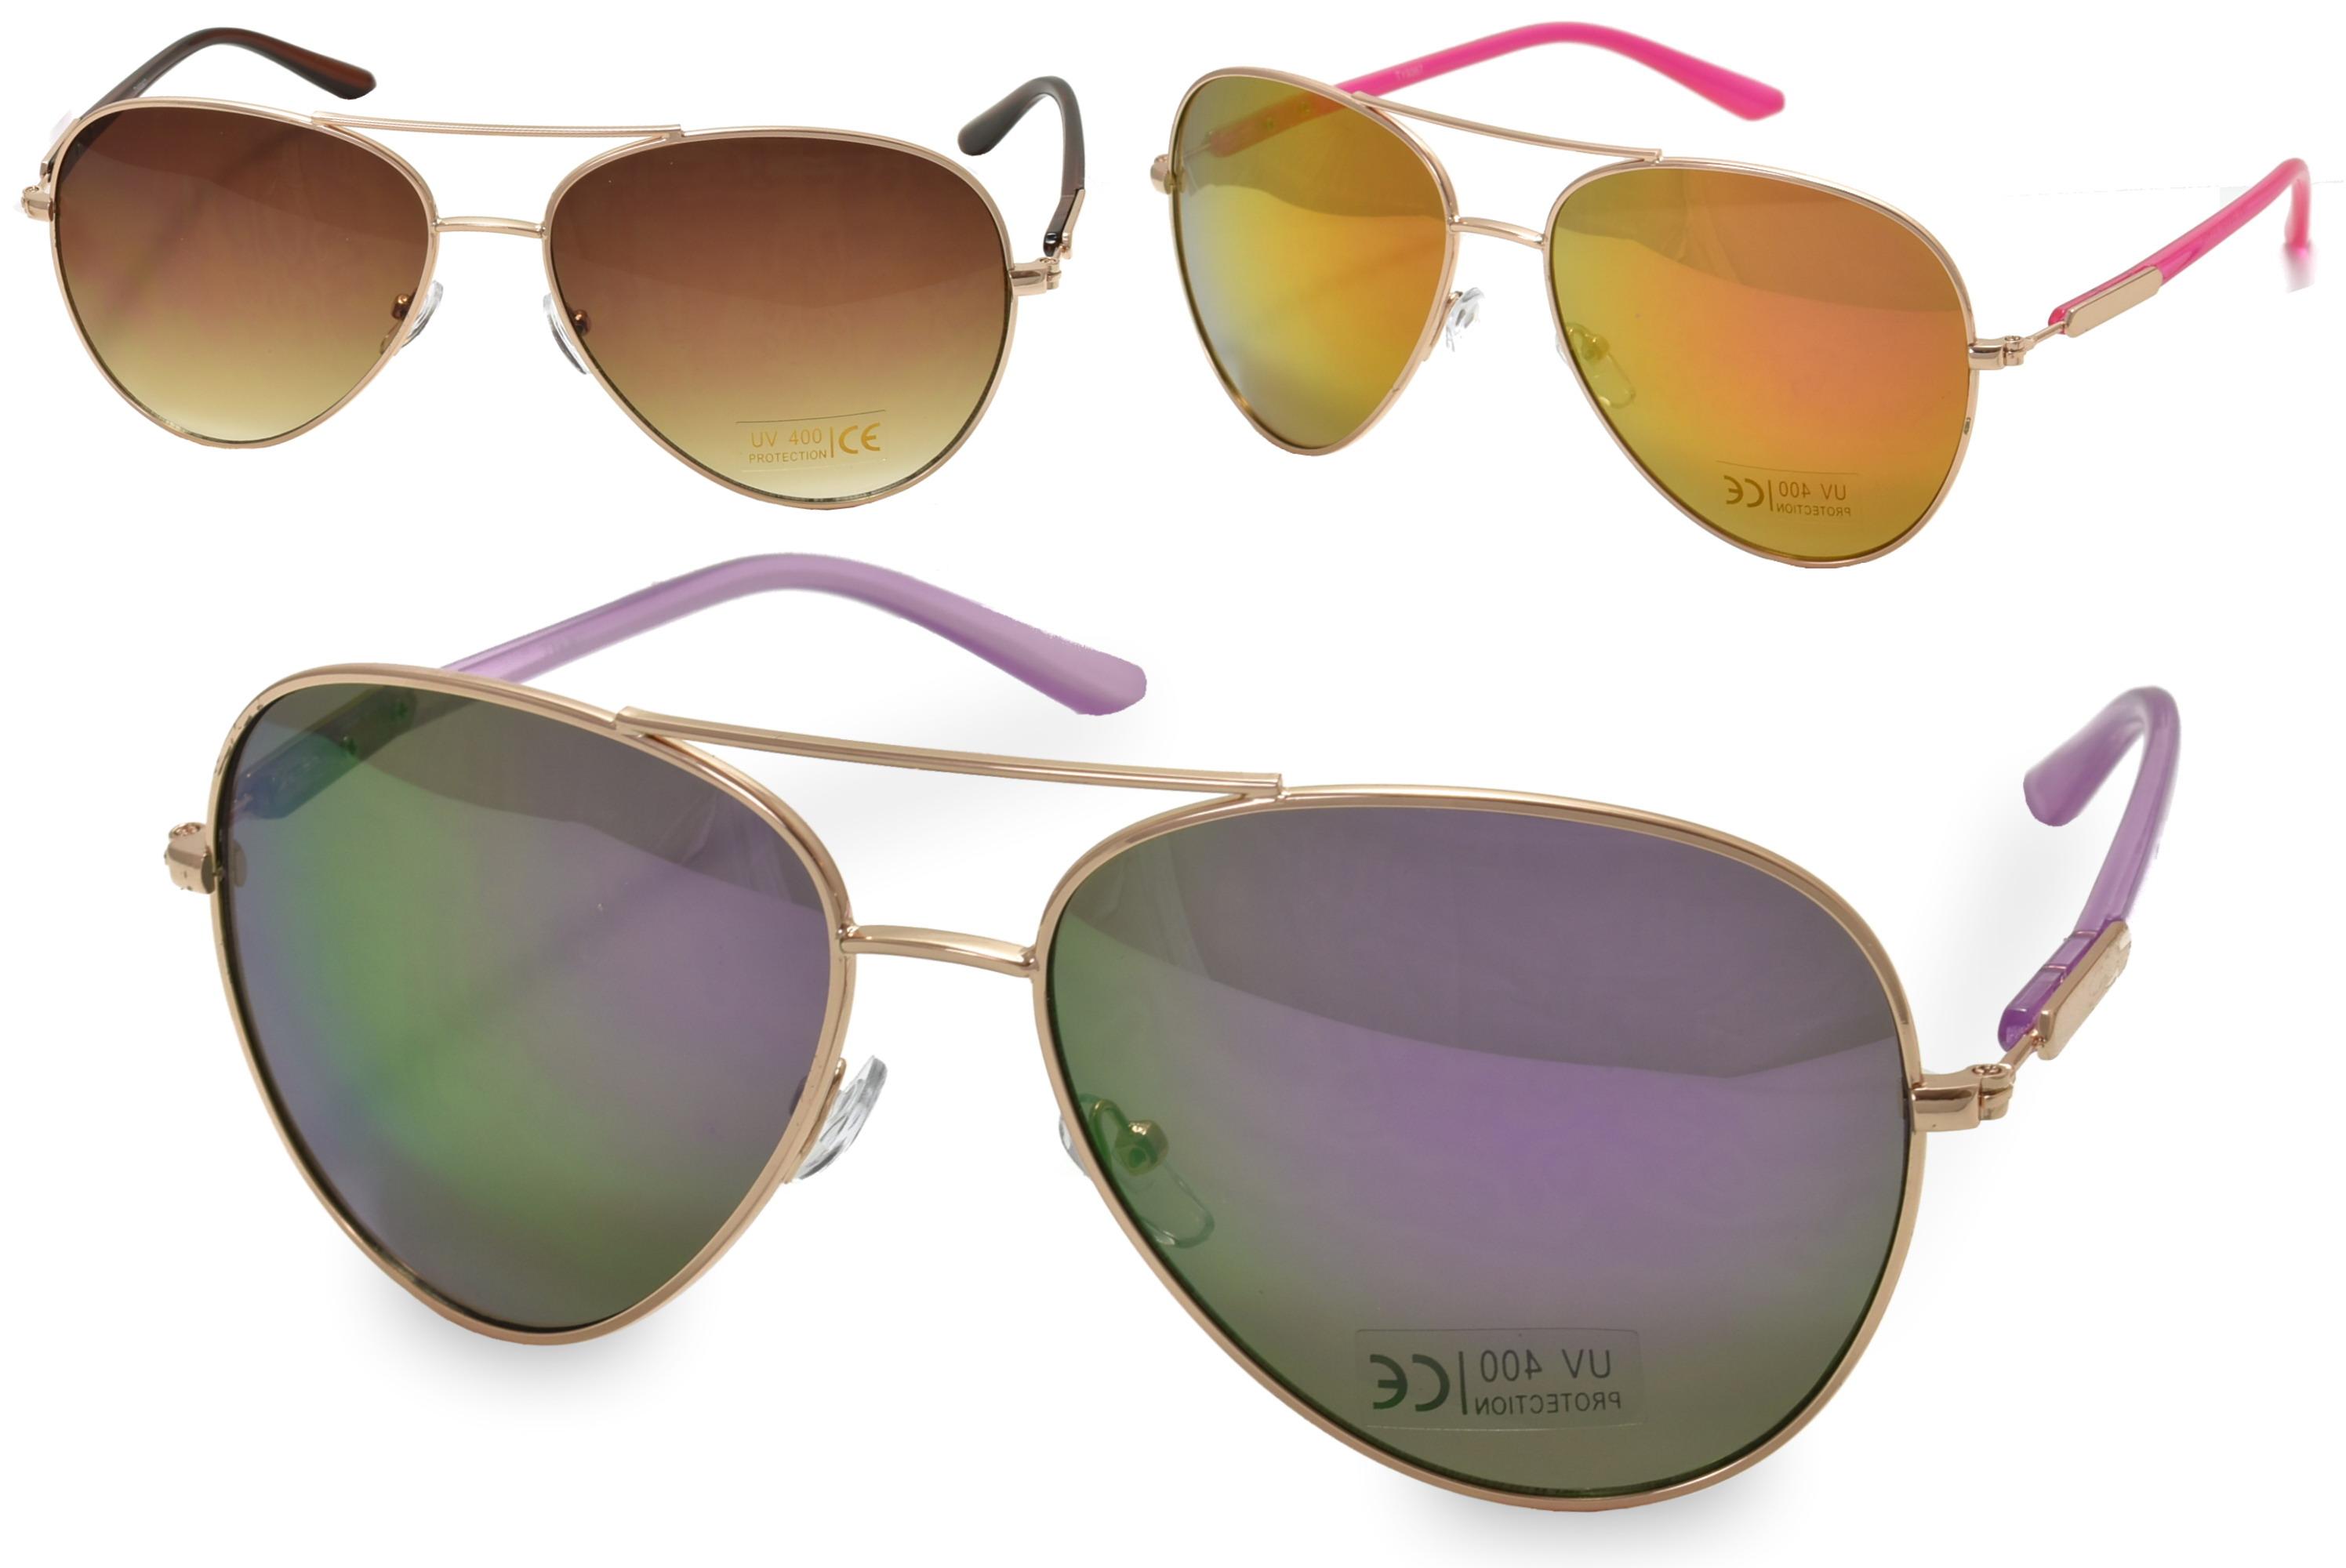 Adults Larger Lense Metal Frame Sunglasses - 4 Assorted